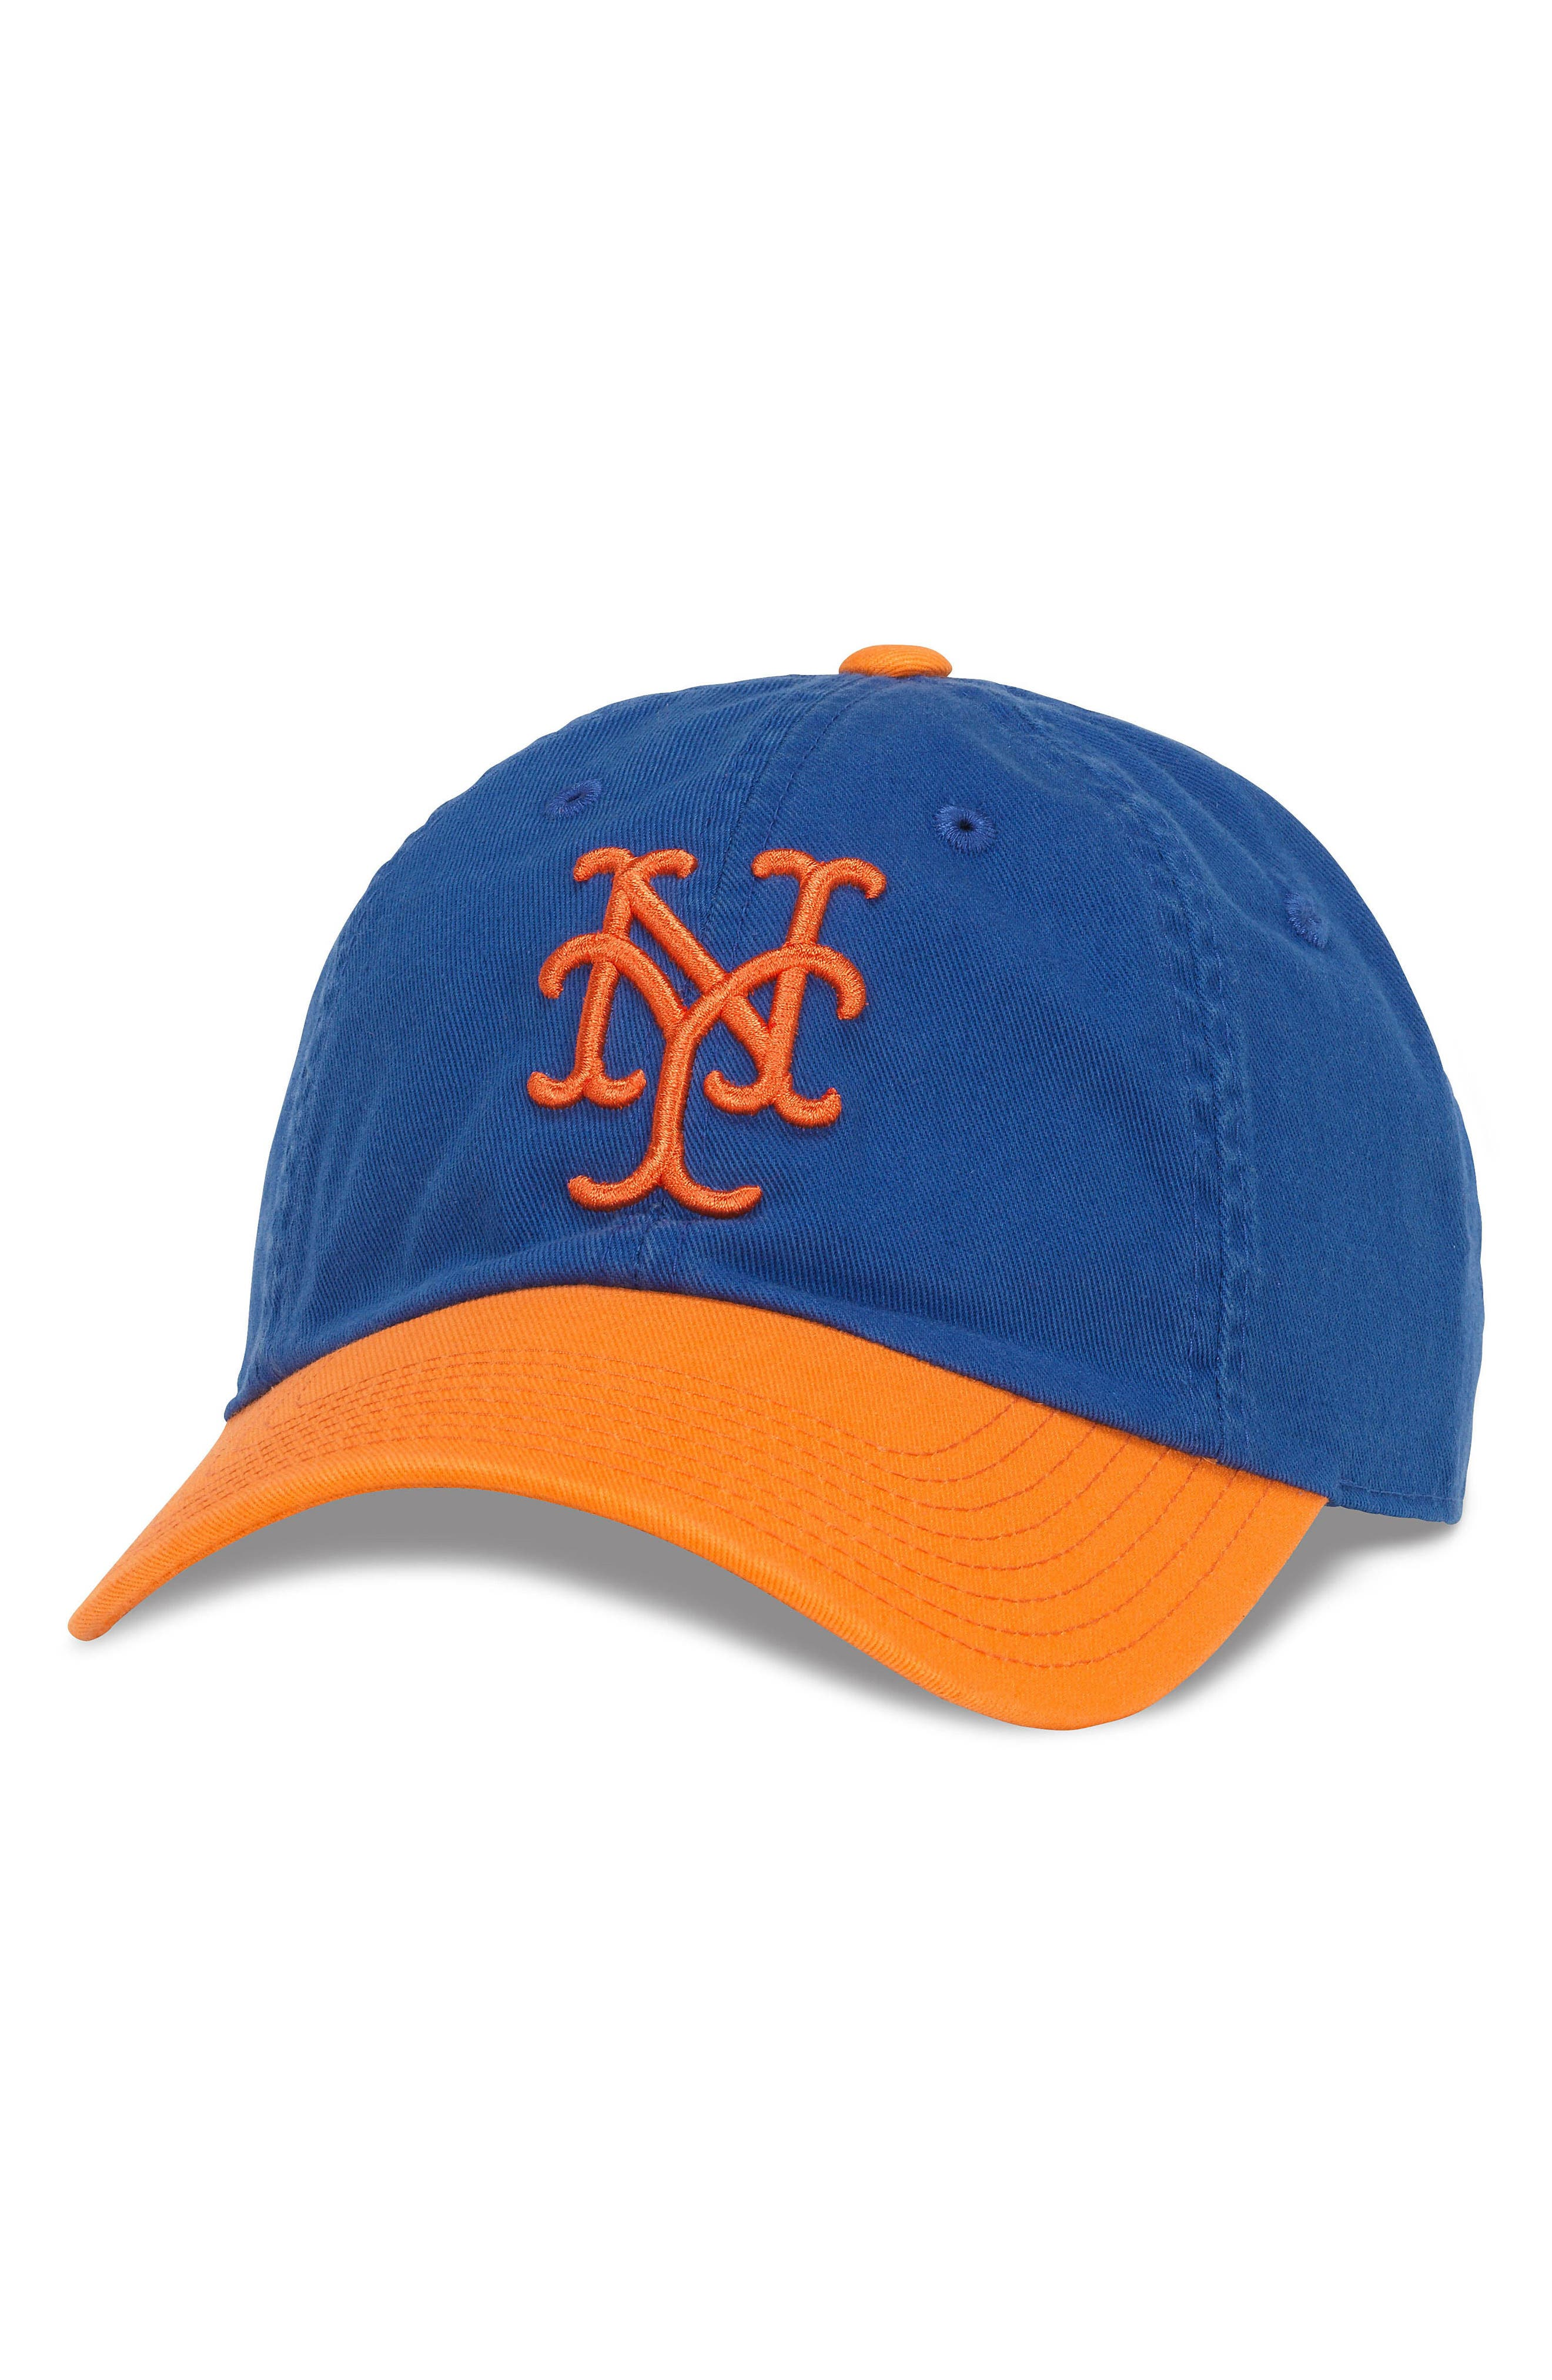 Alternate Image 1 Selected - American Needle Ballpark MLB Baseball Cap